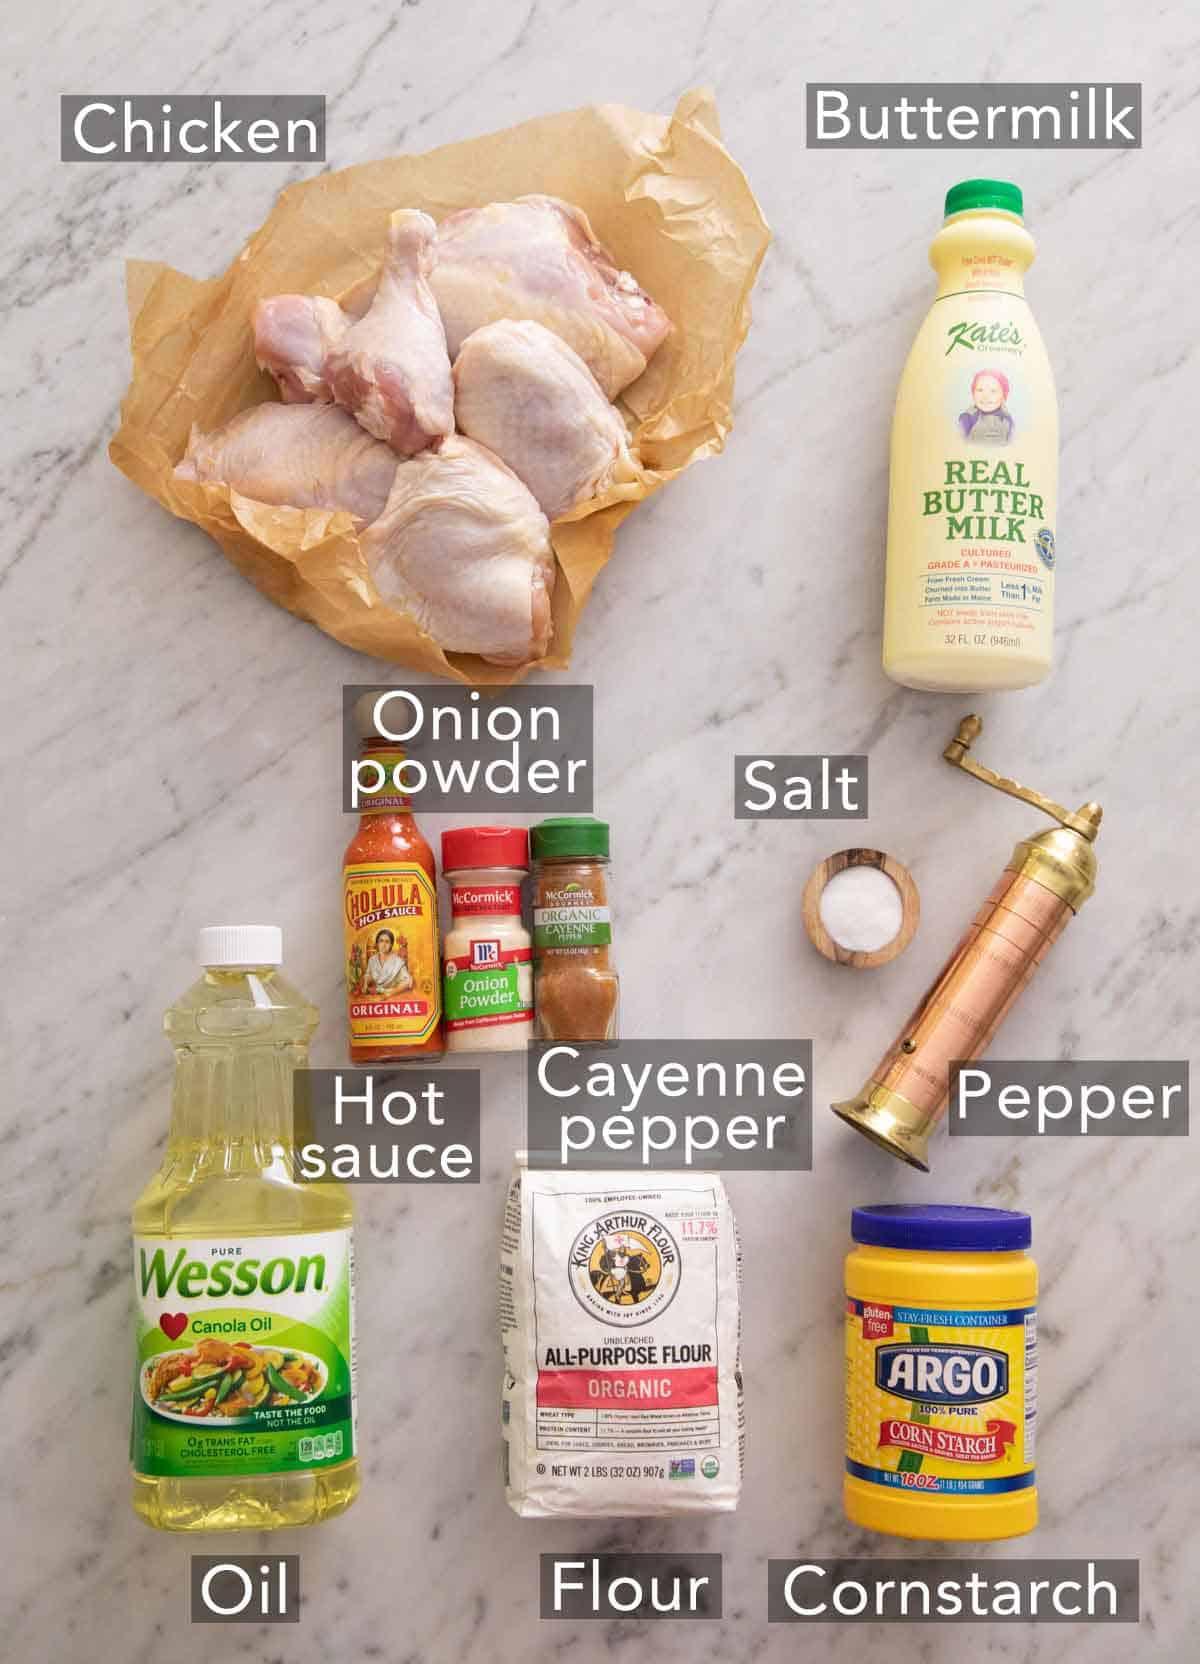 Ingredients needed to make fried chicken.